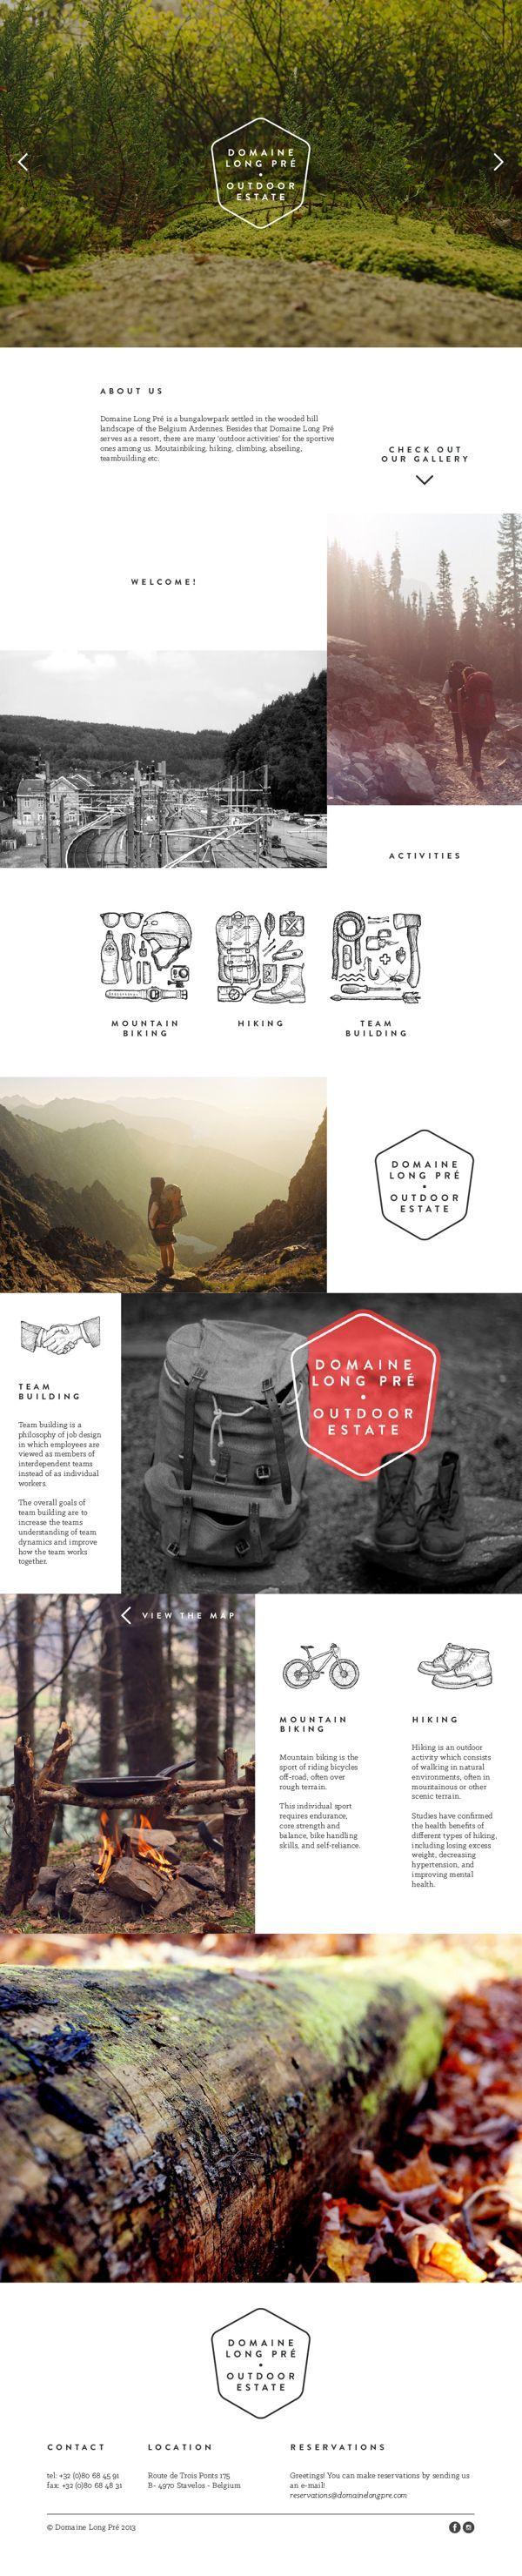 Cool Brand Identity Design on the Internet. Domaine. #branding #brandidentity #identitydesign @ http://www.pinterest.com/alfredchong/brand-identity/